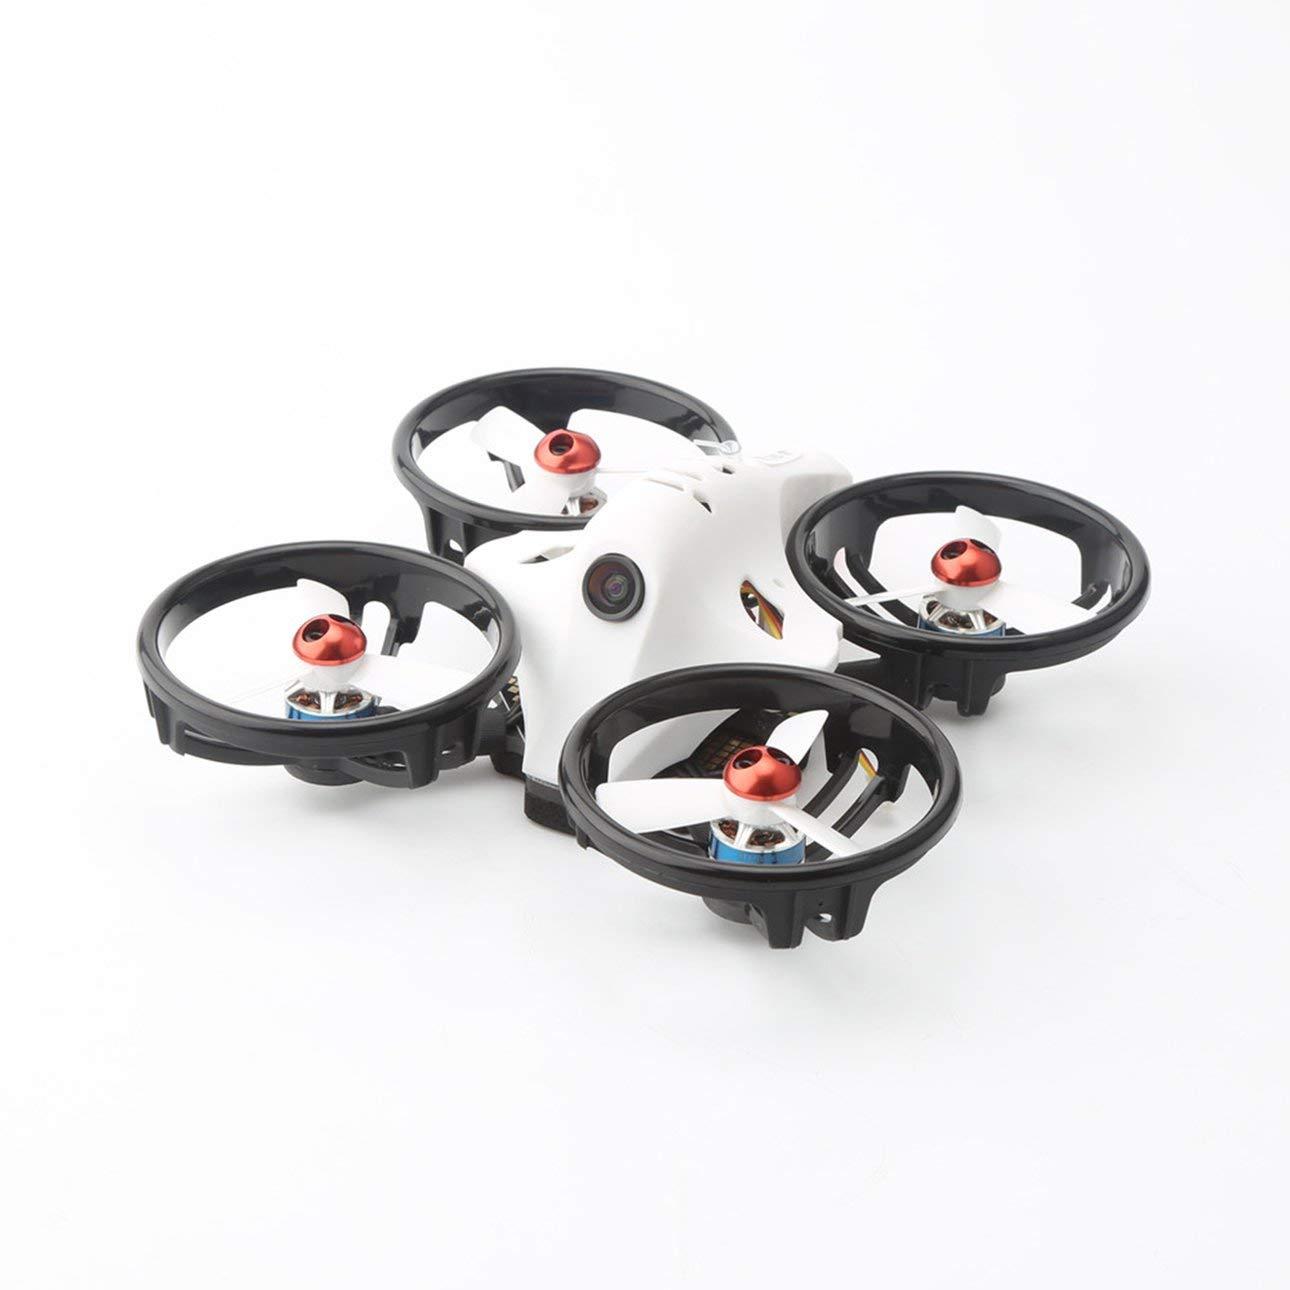 Drohne mit Kamera LDARC ET100 5,8 G Brushless AC900 Empfänger OSD Cam FPV Mini RC Racing Drone PNP Ballylyly